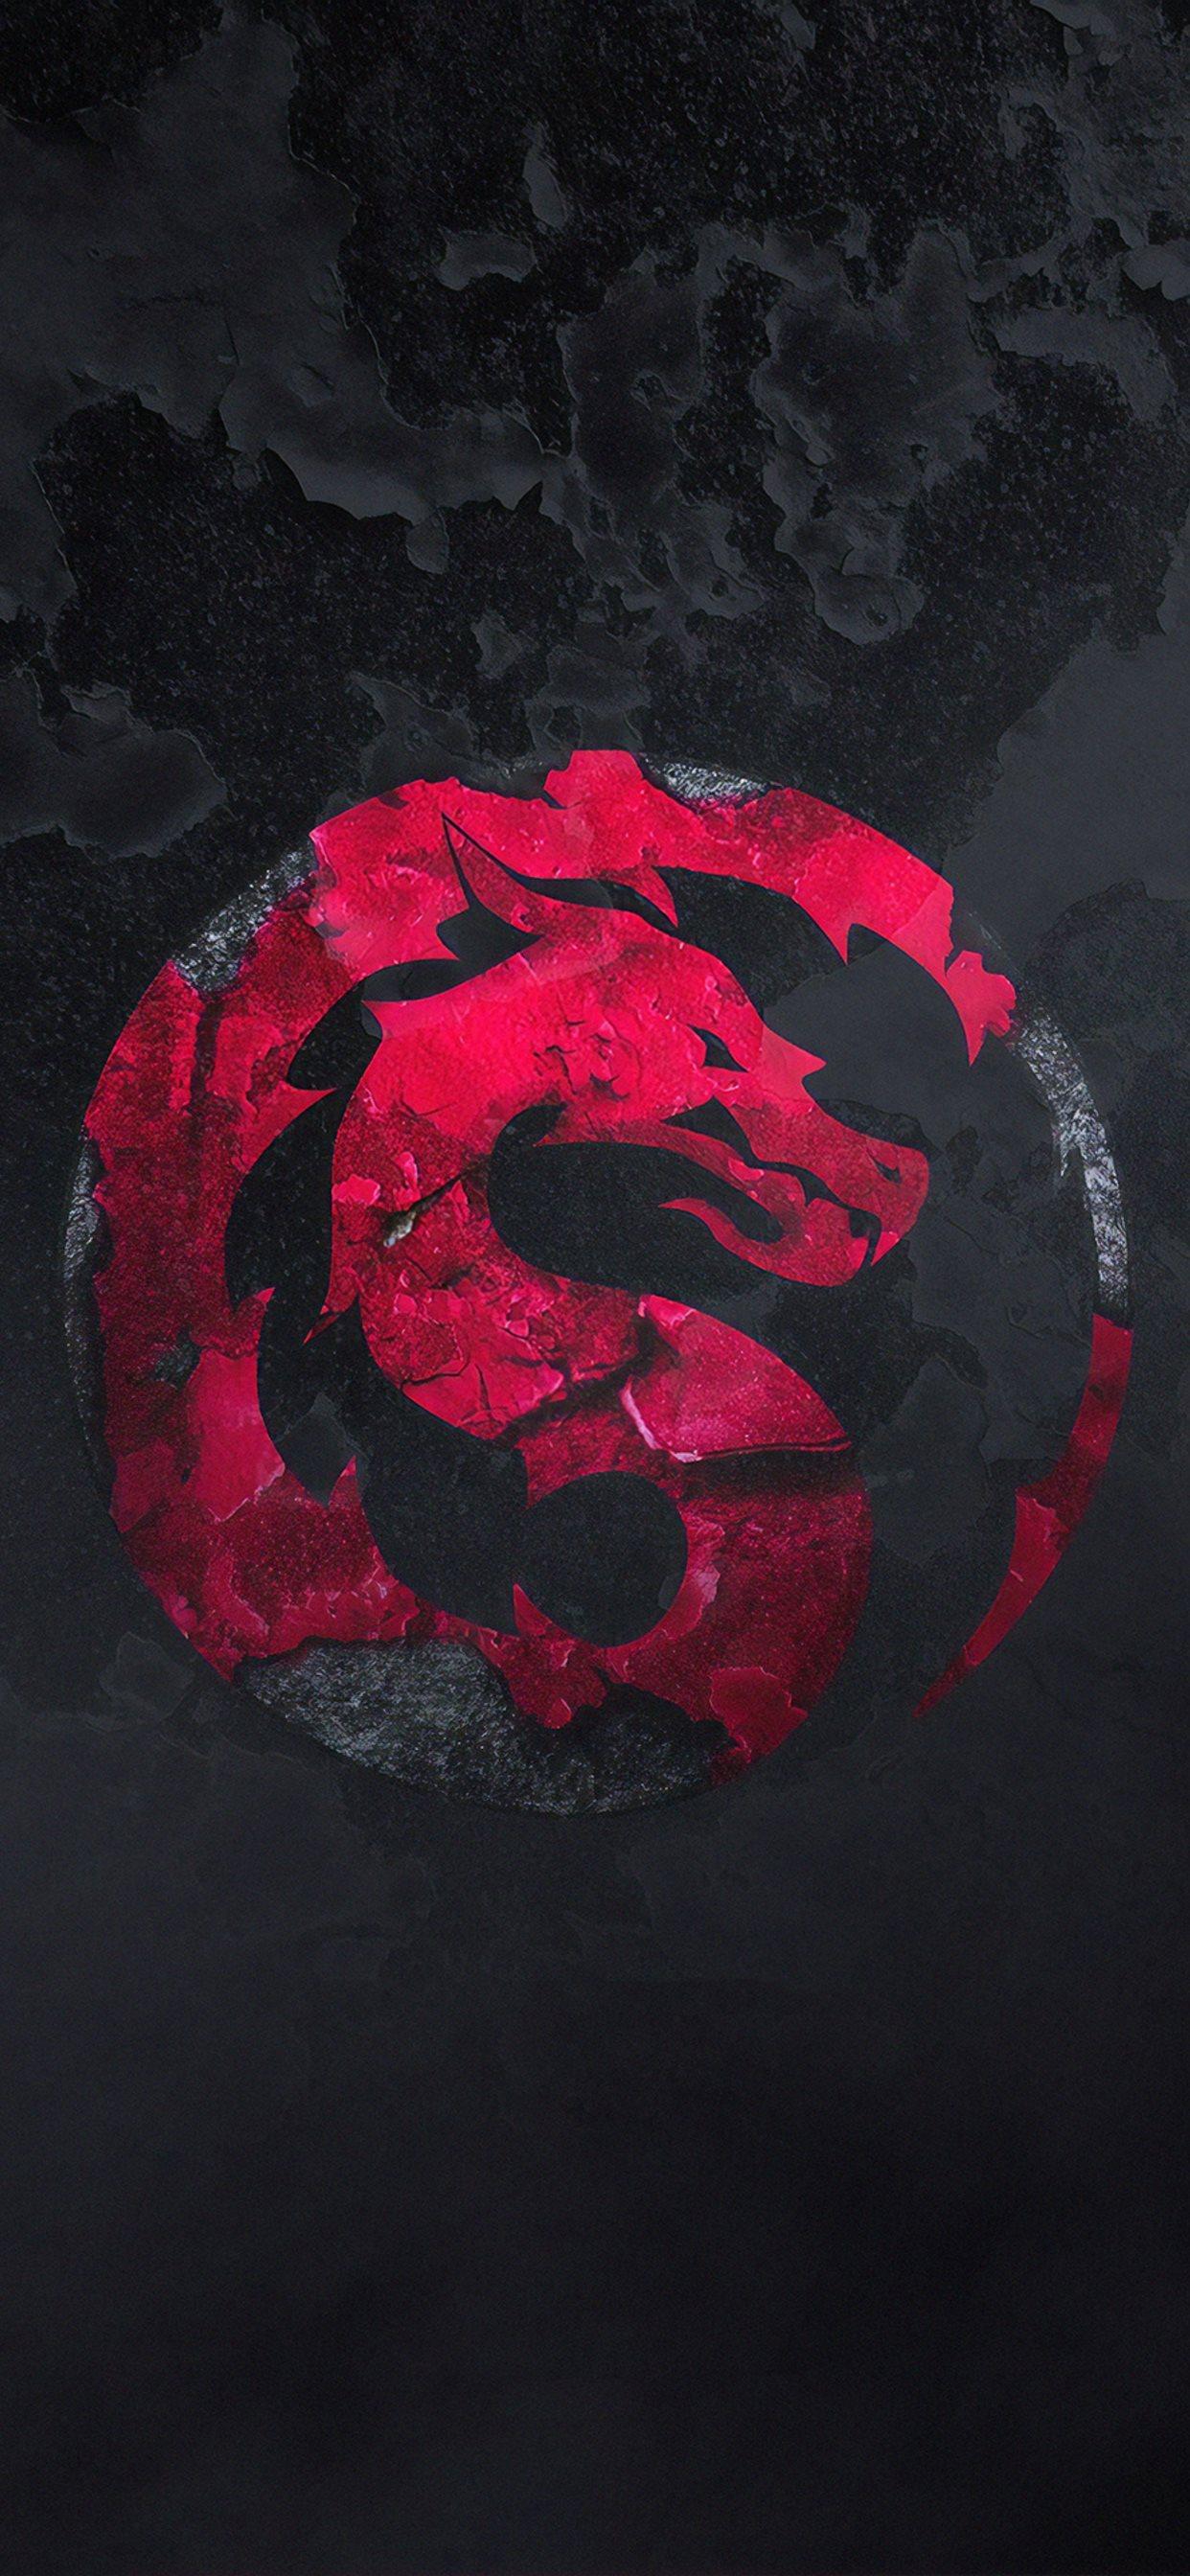 Mortal Kombat X Wallpapers Hd Wallpaper Scorpion Character